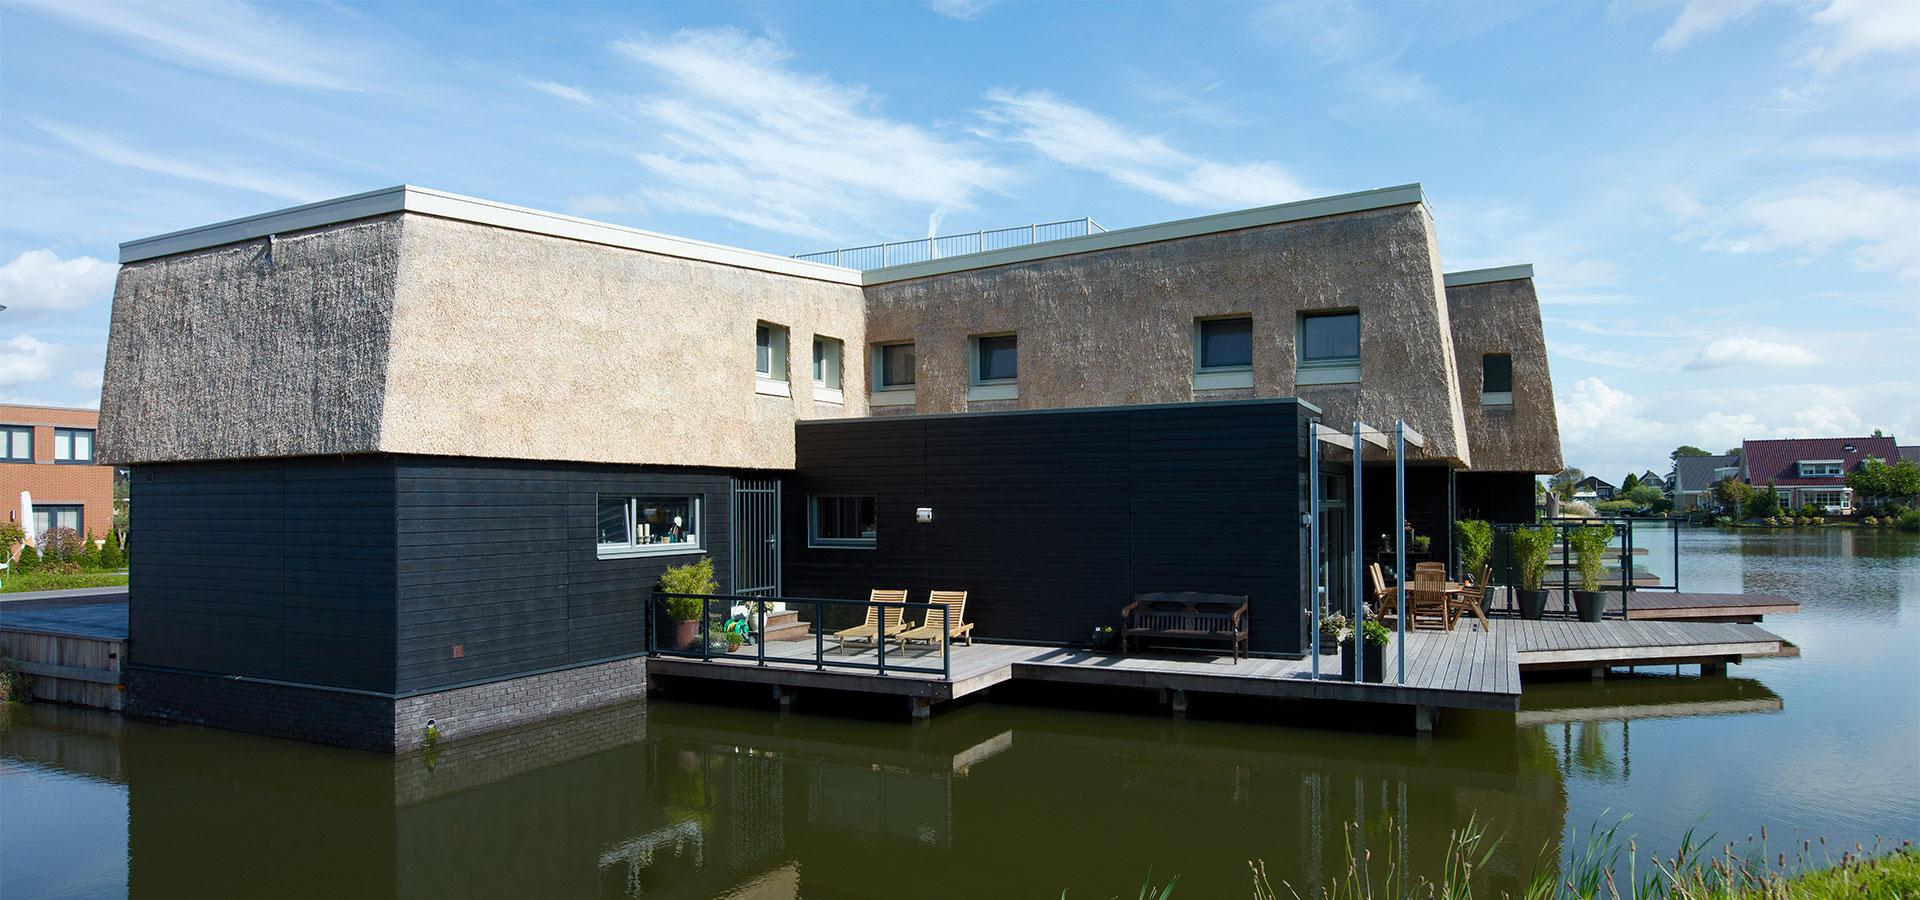 FARO architecten Waterwoningen Nesselande Rotterdam 02